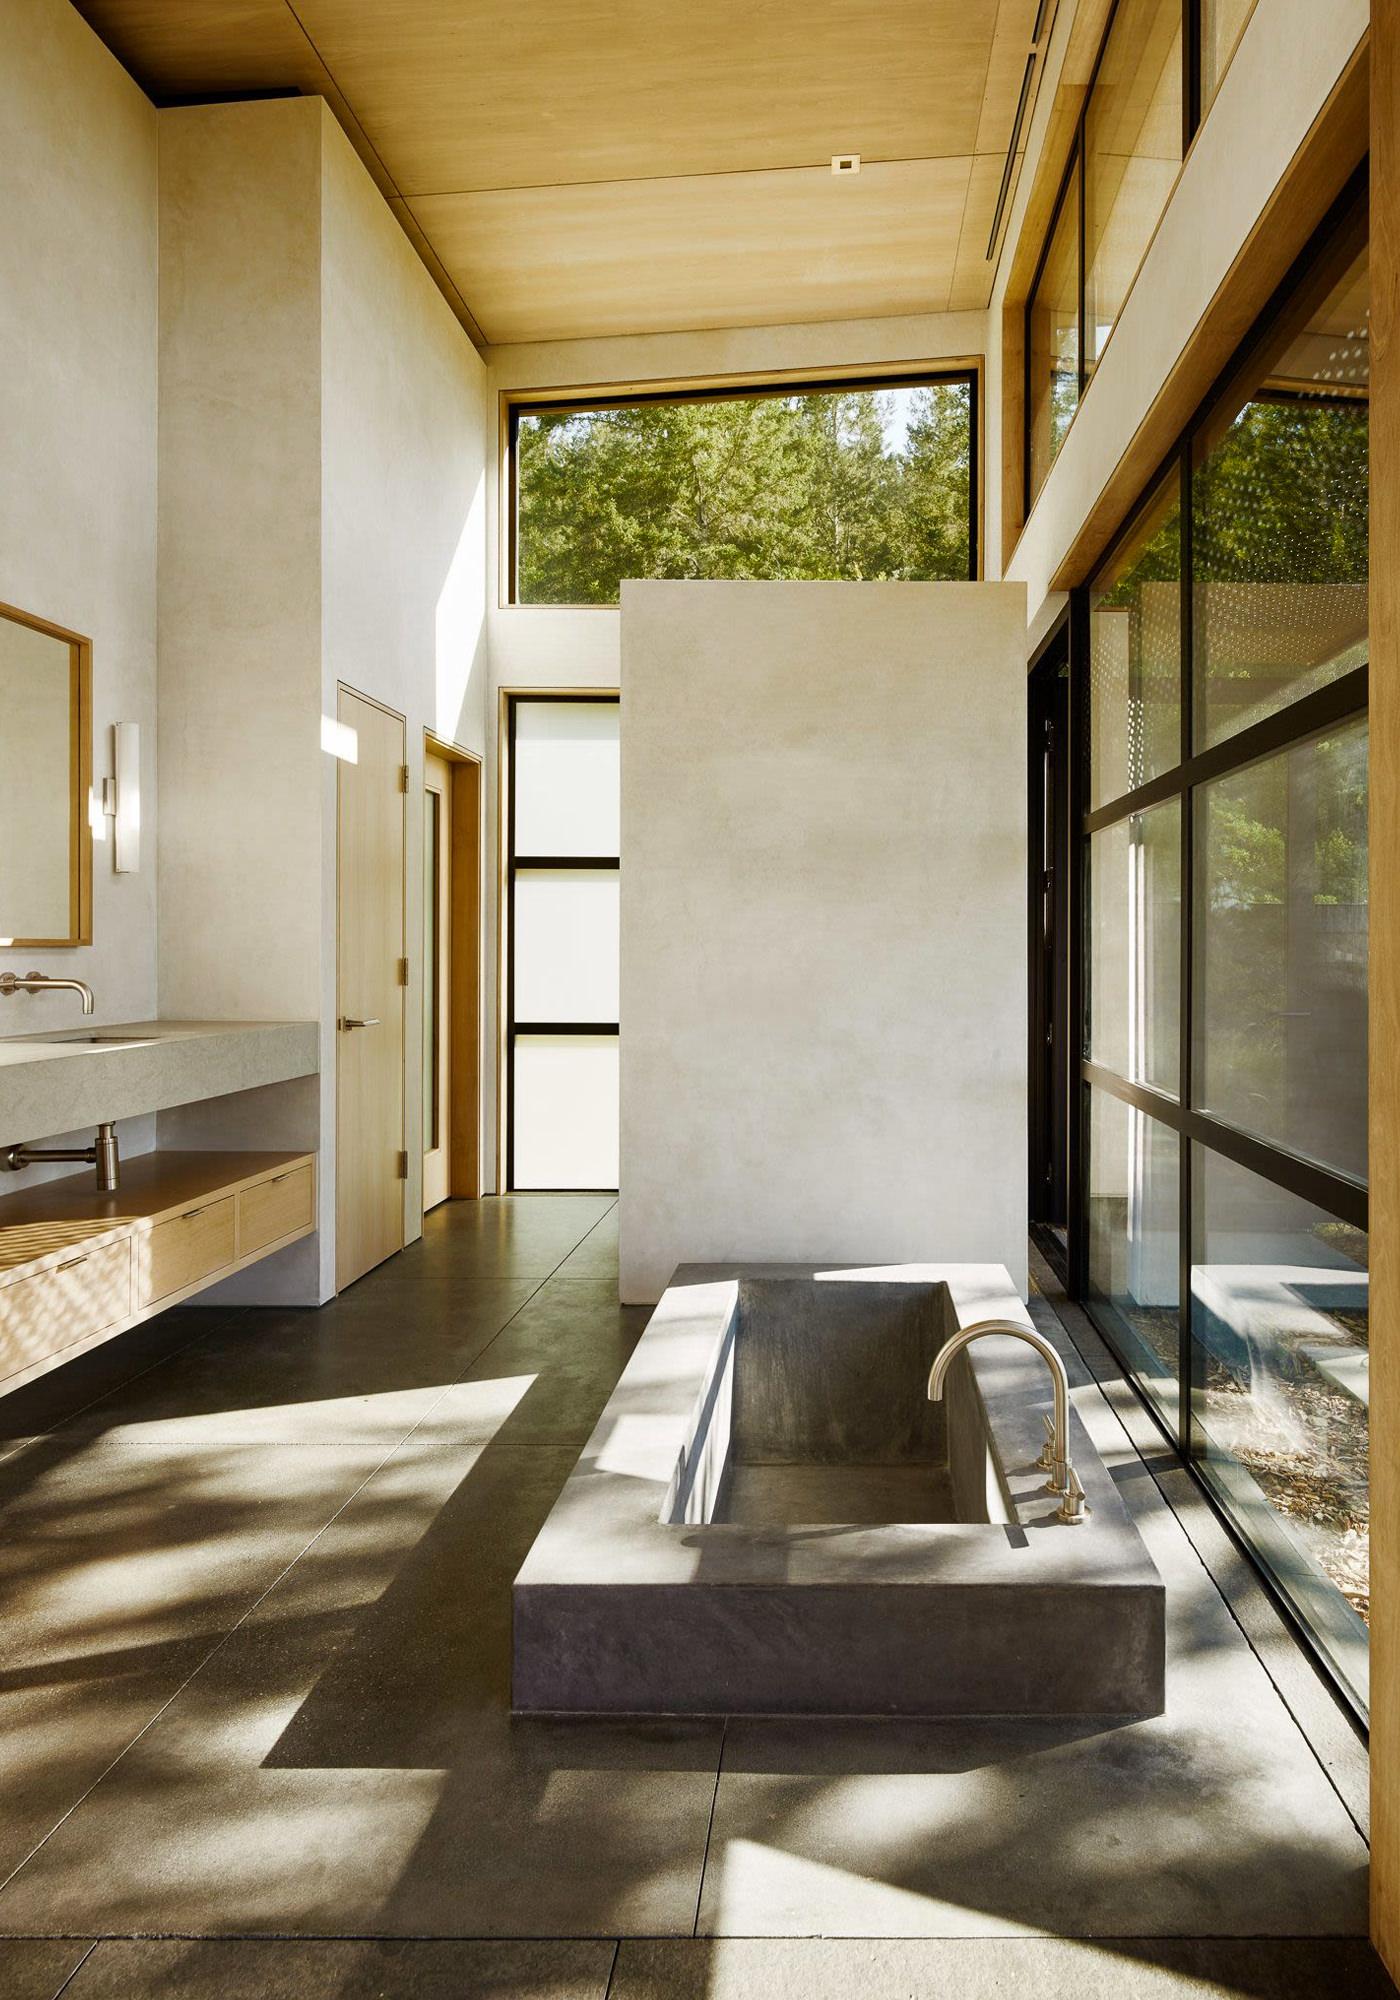 Healdsburg House Sonoma Californie Architecture Salle de Bains